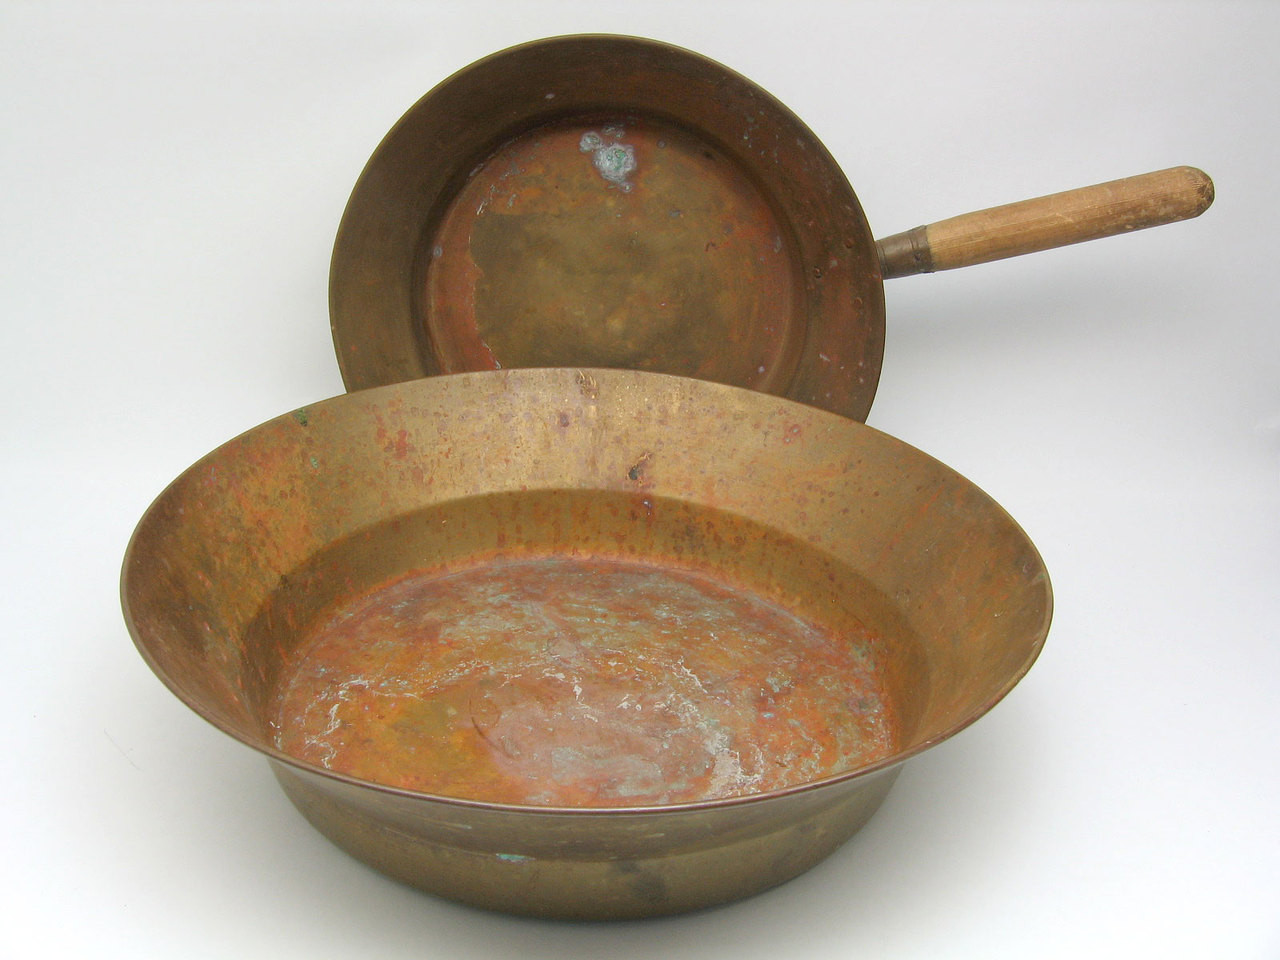 Vintage Kolchugino and Tula jam and sauce making pans